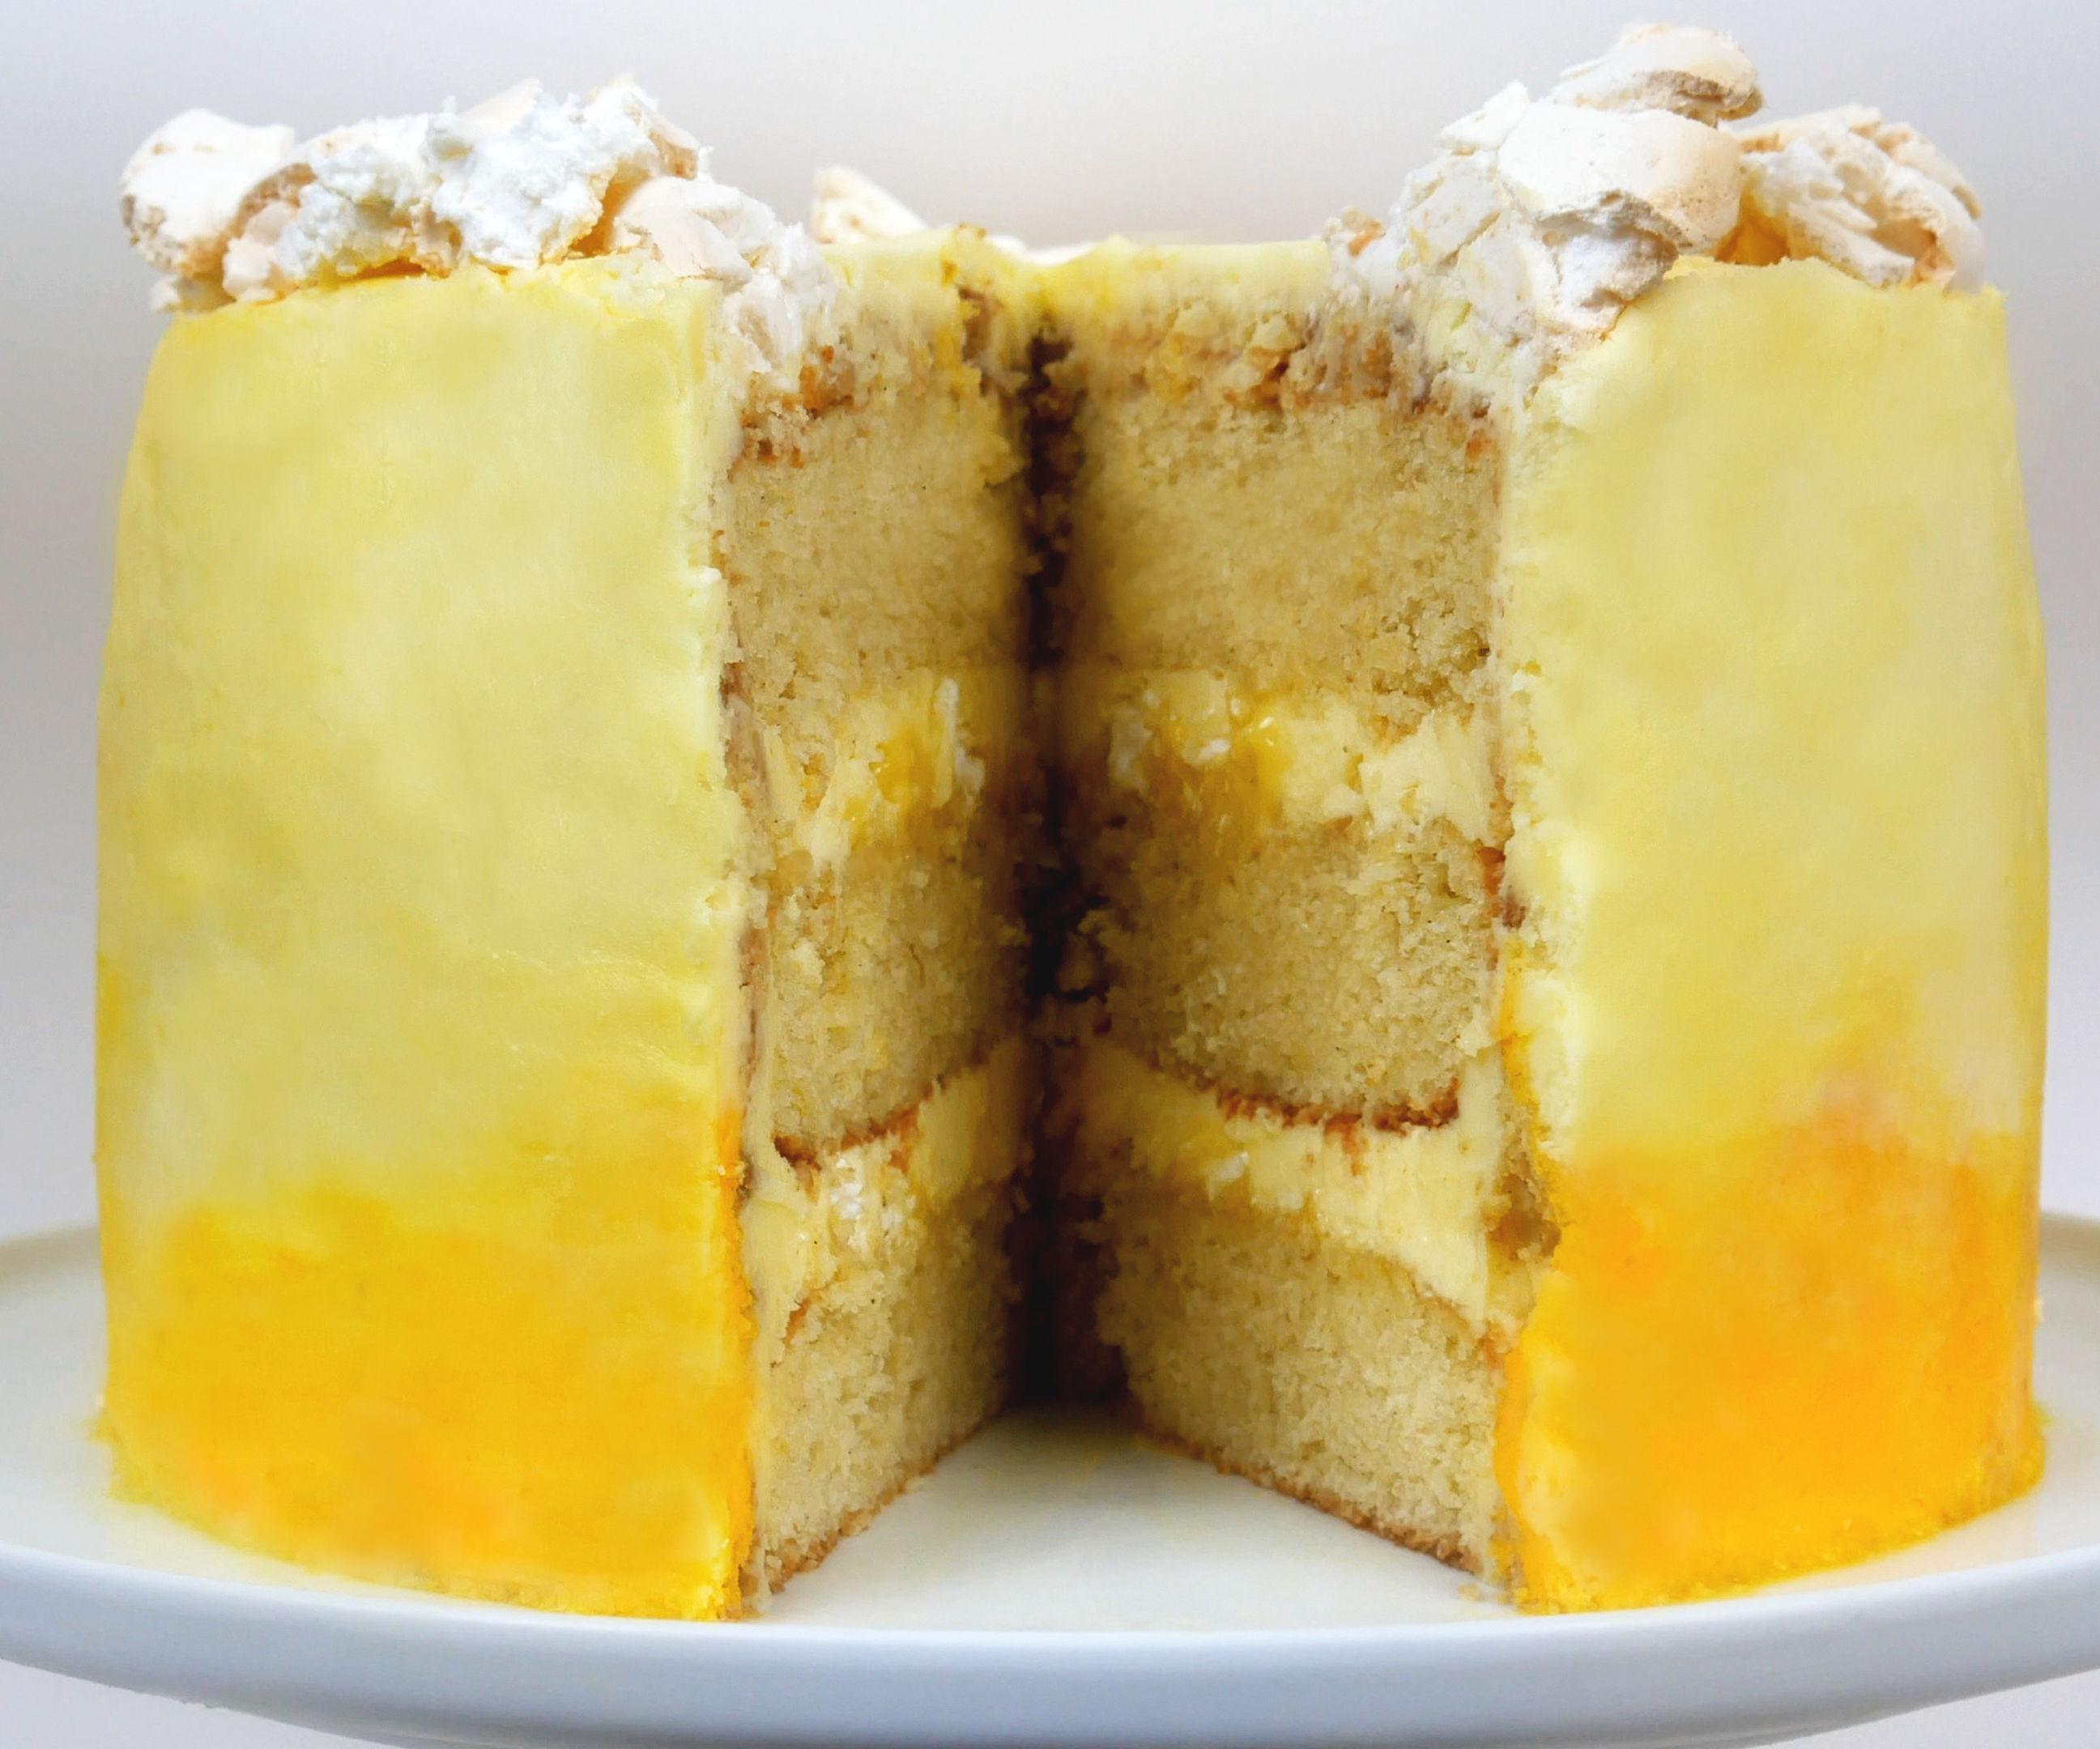 ZESTY LEMON MERINGUE CAKE